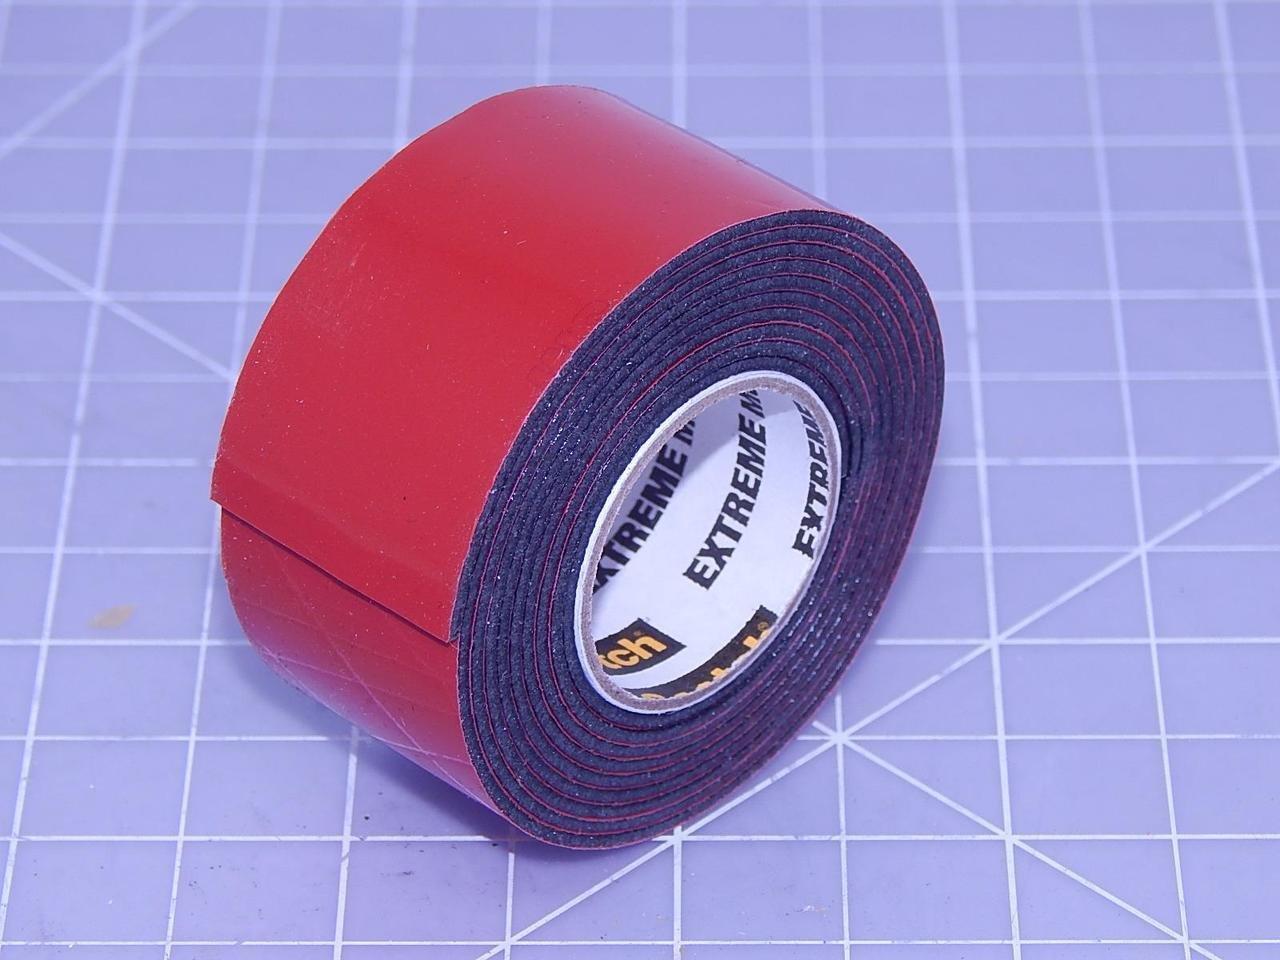 Scotch Extreme Mounting Tape 1''x60'' (30 lbs) by Scotch (Image #2)